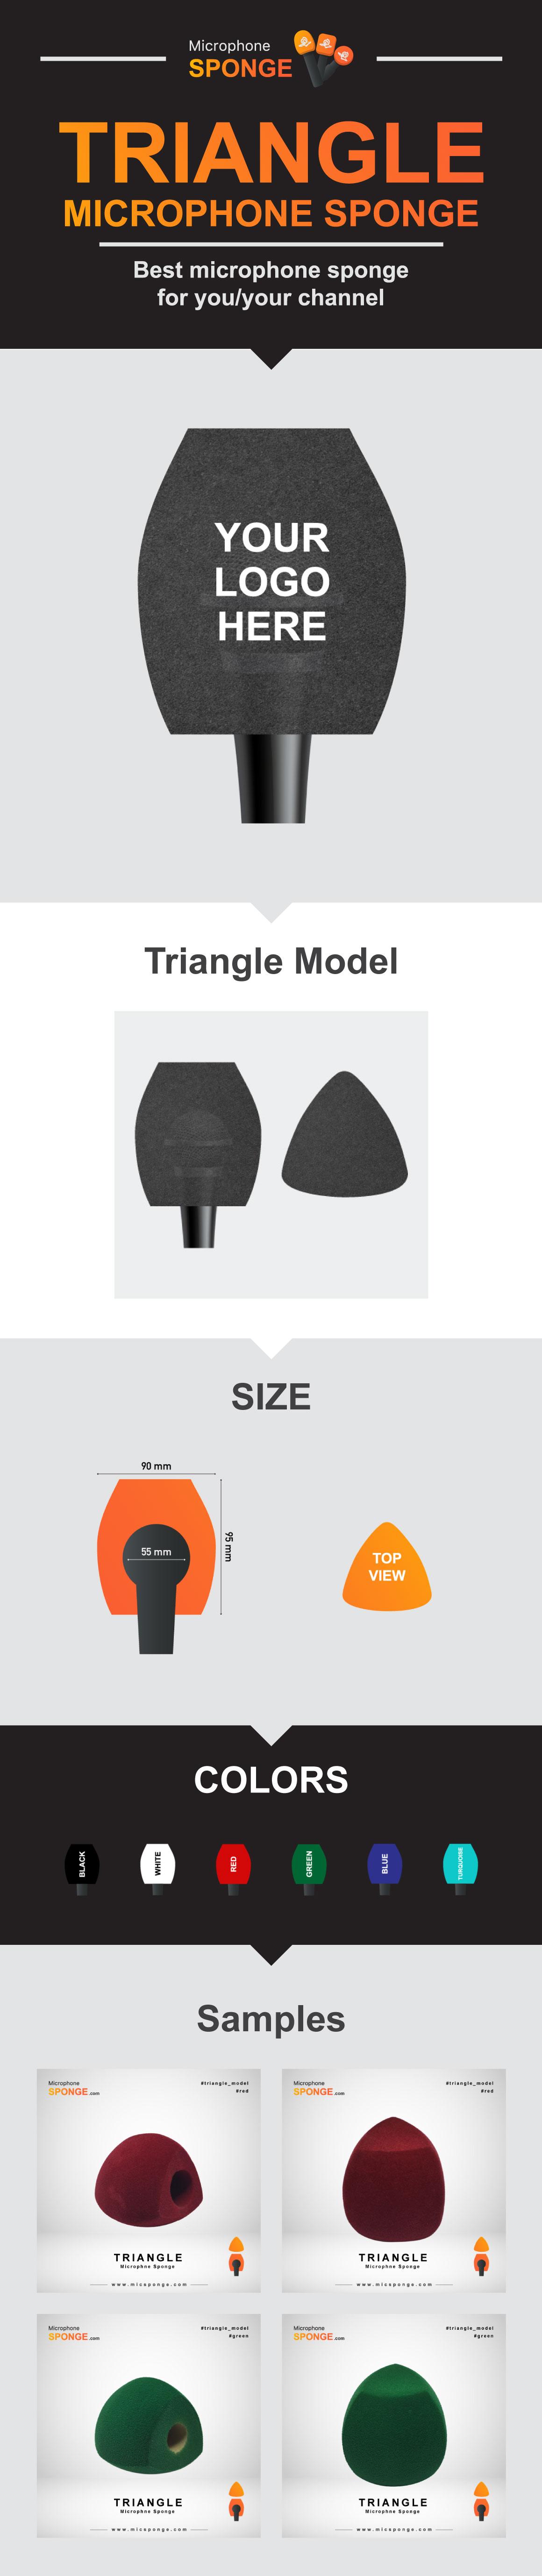 Microphone Sponge Triangle